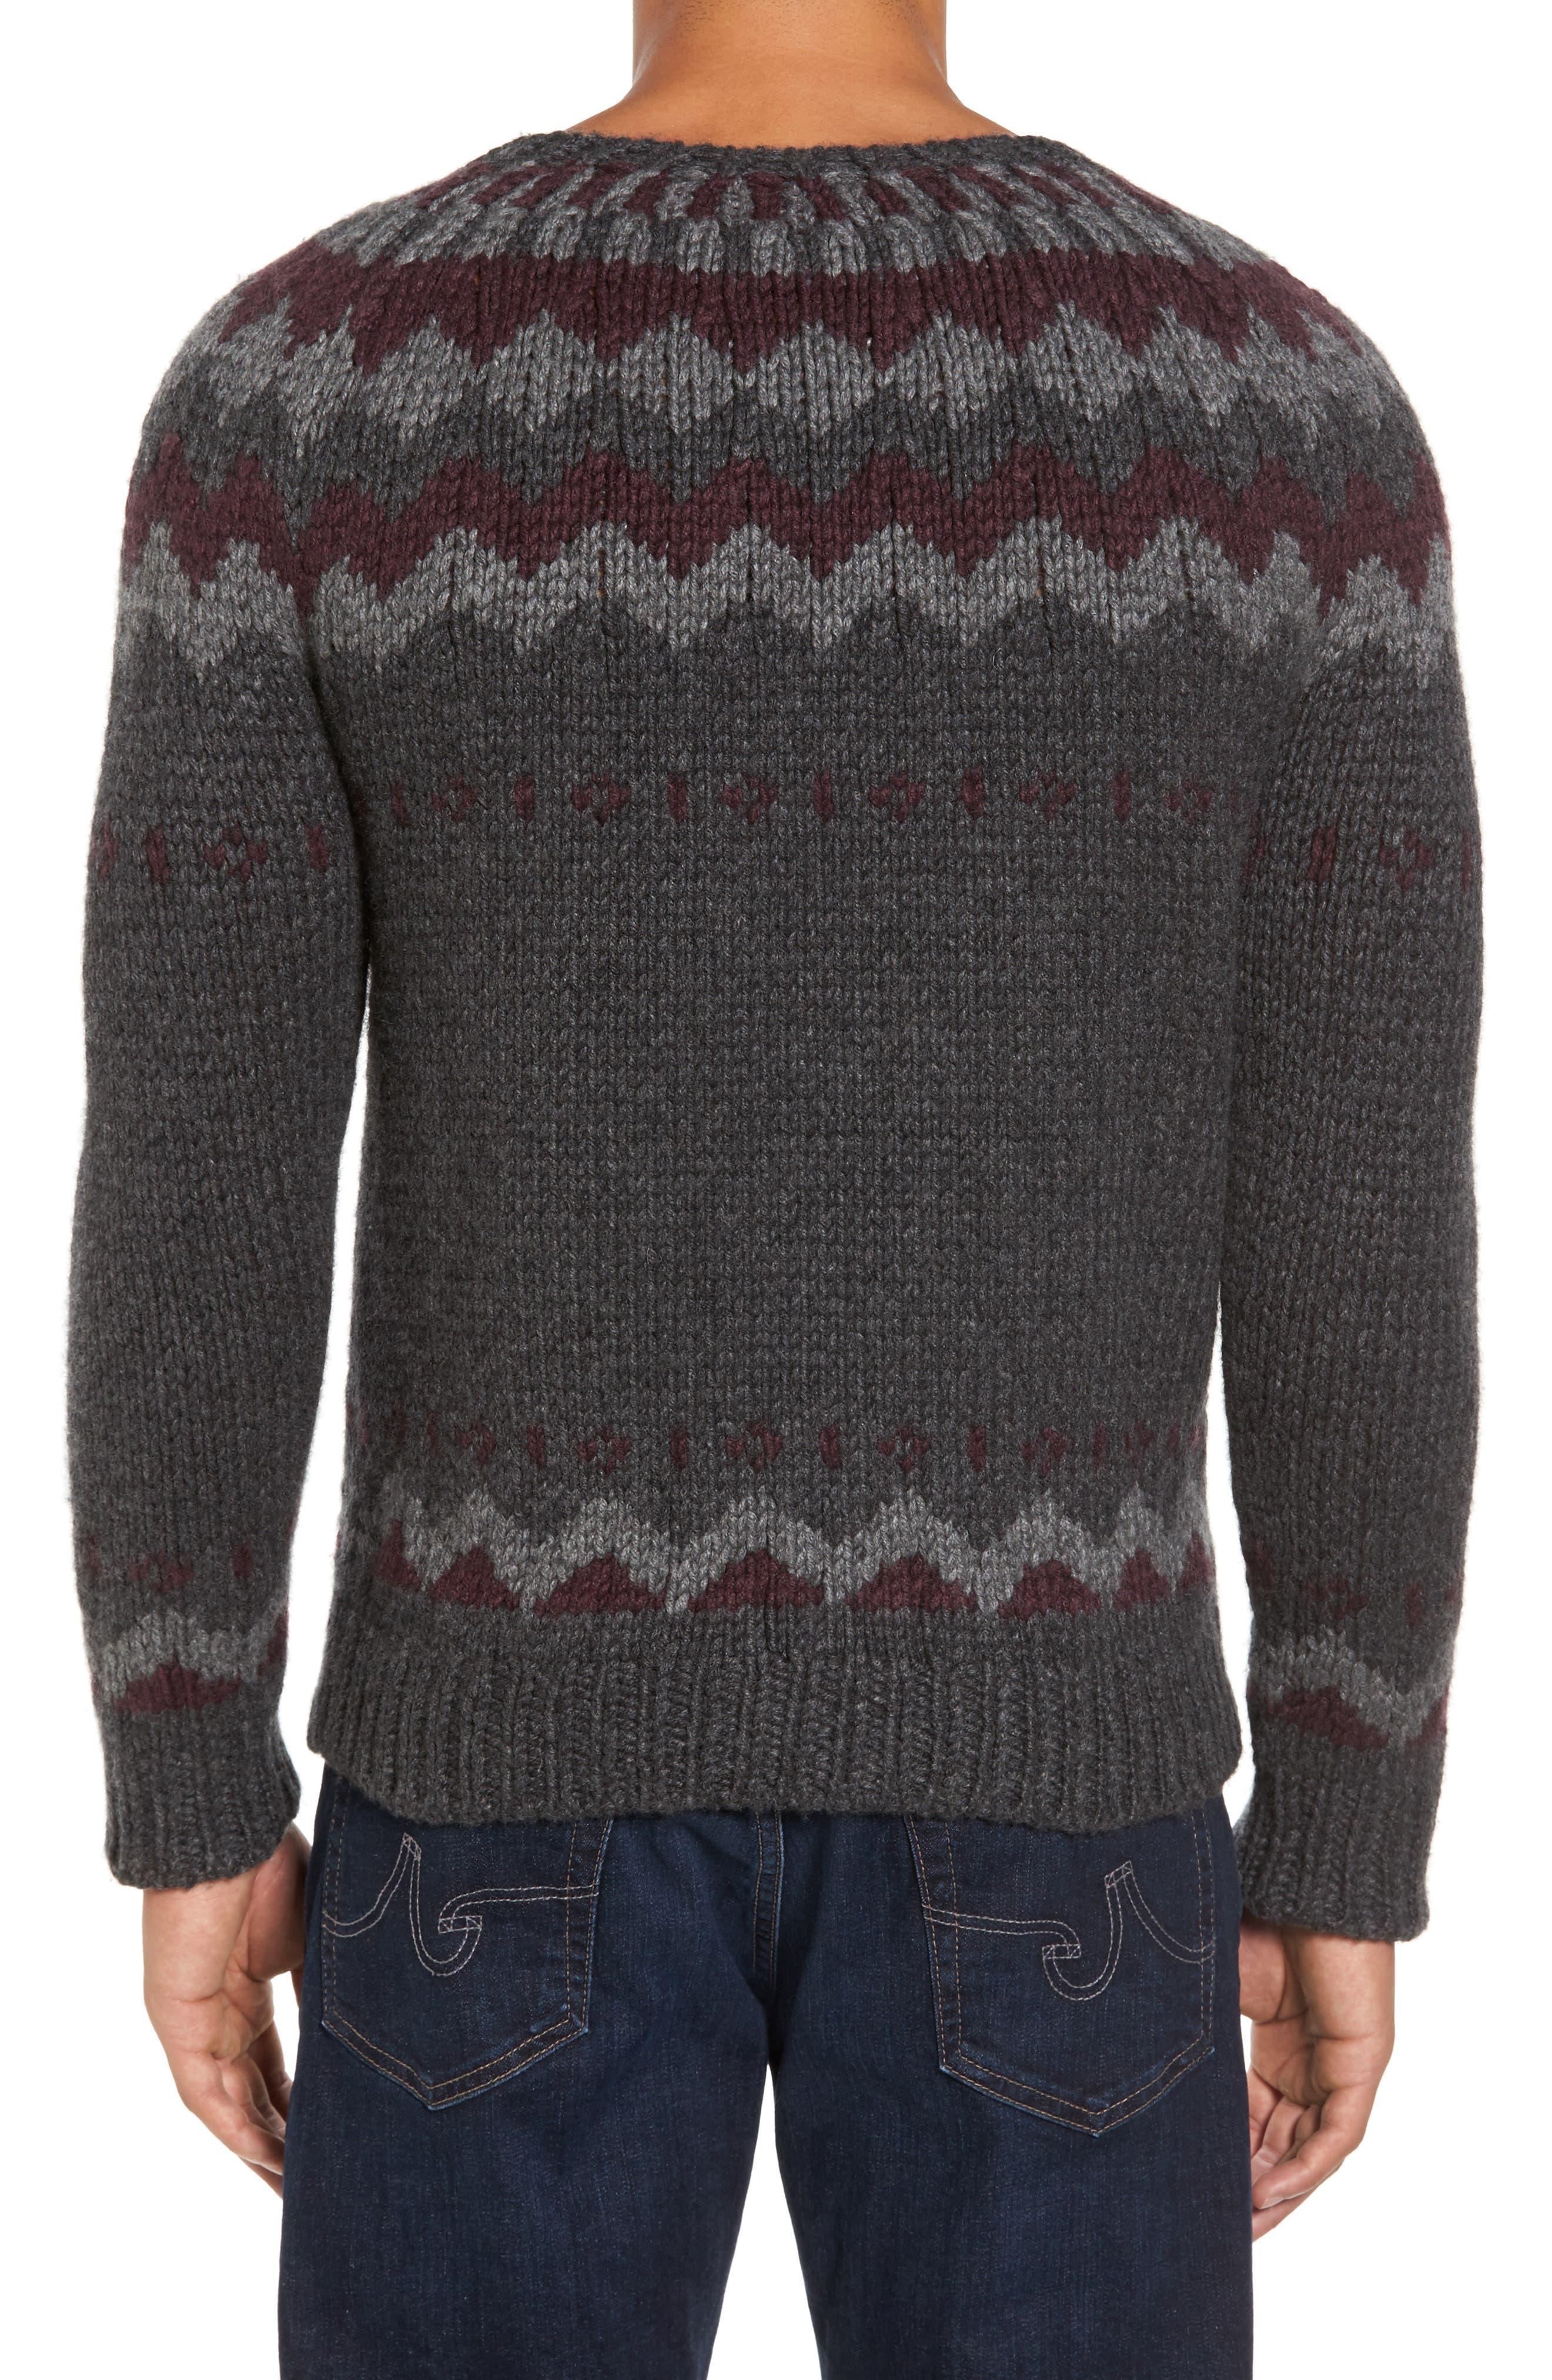 Intarsia Cashmere Sweater,                             Alternate thumbnail 2, color,                             035